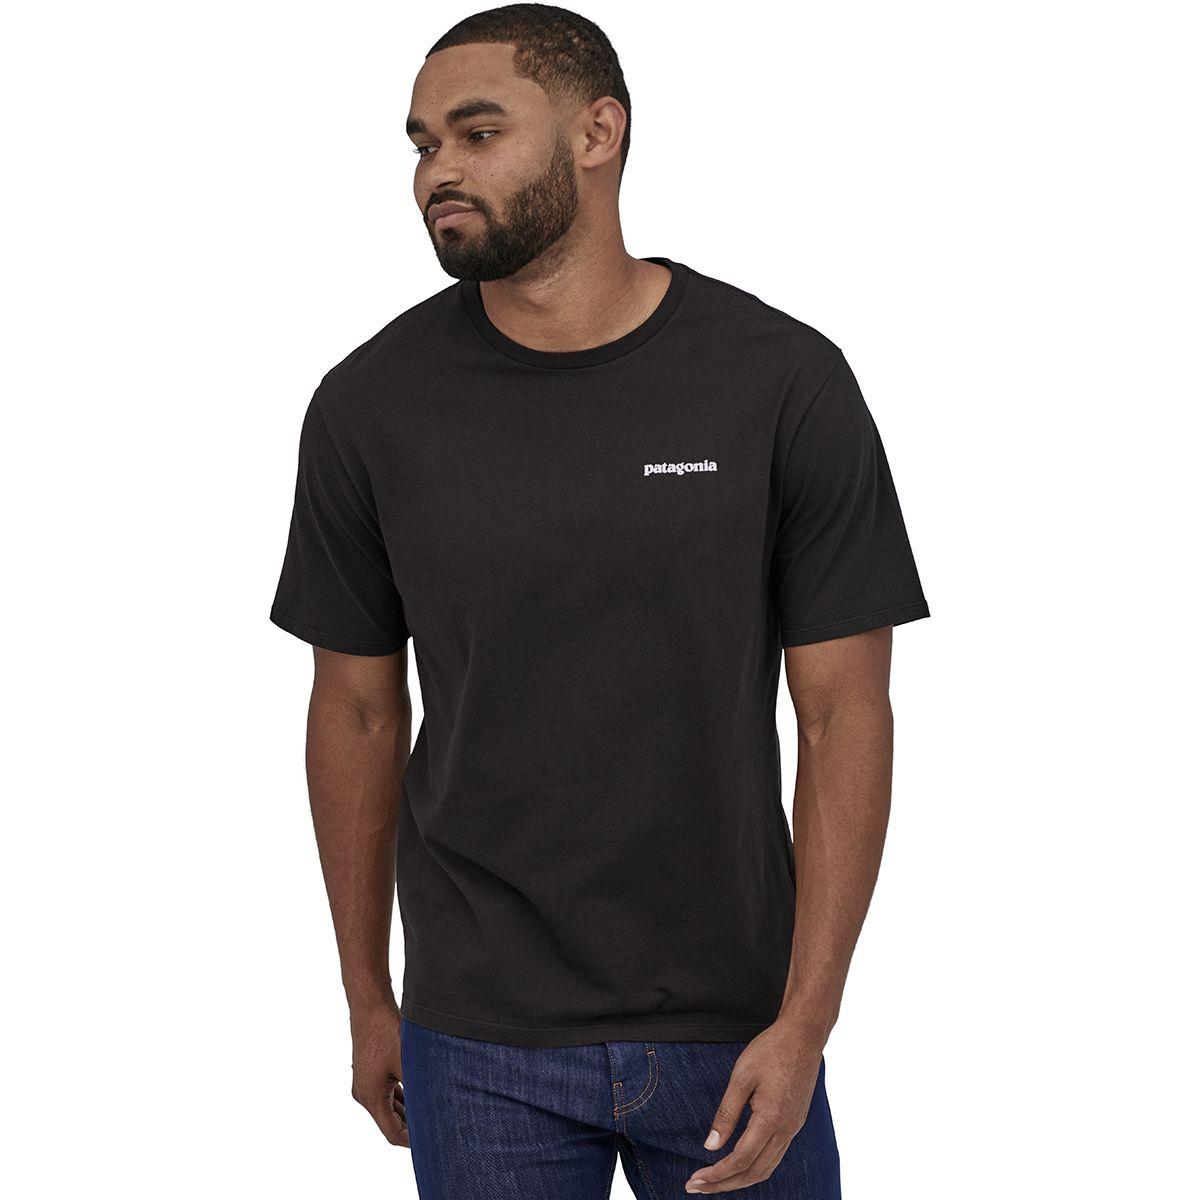 PatagoniaMens P-6 Logo Organic Cotton T-shirtFeather Grey